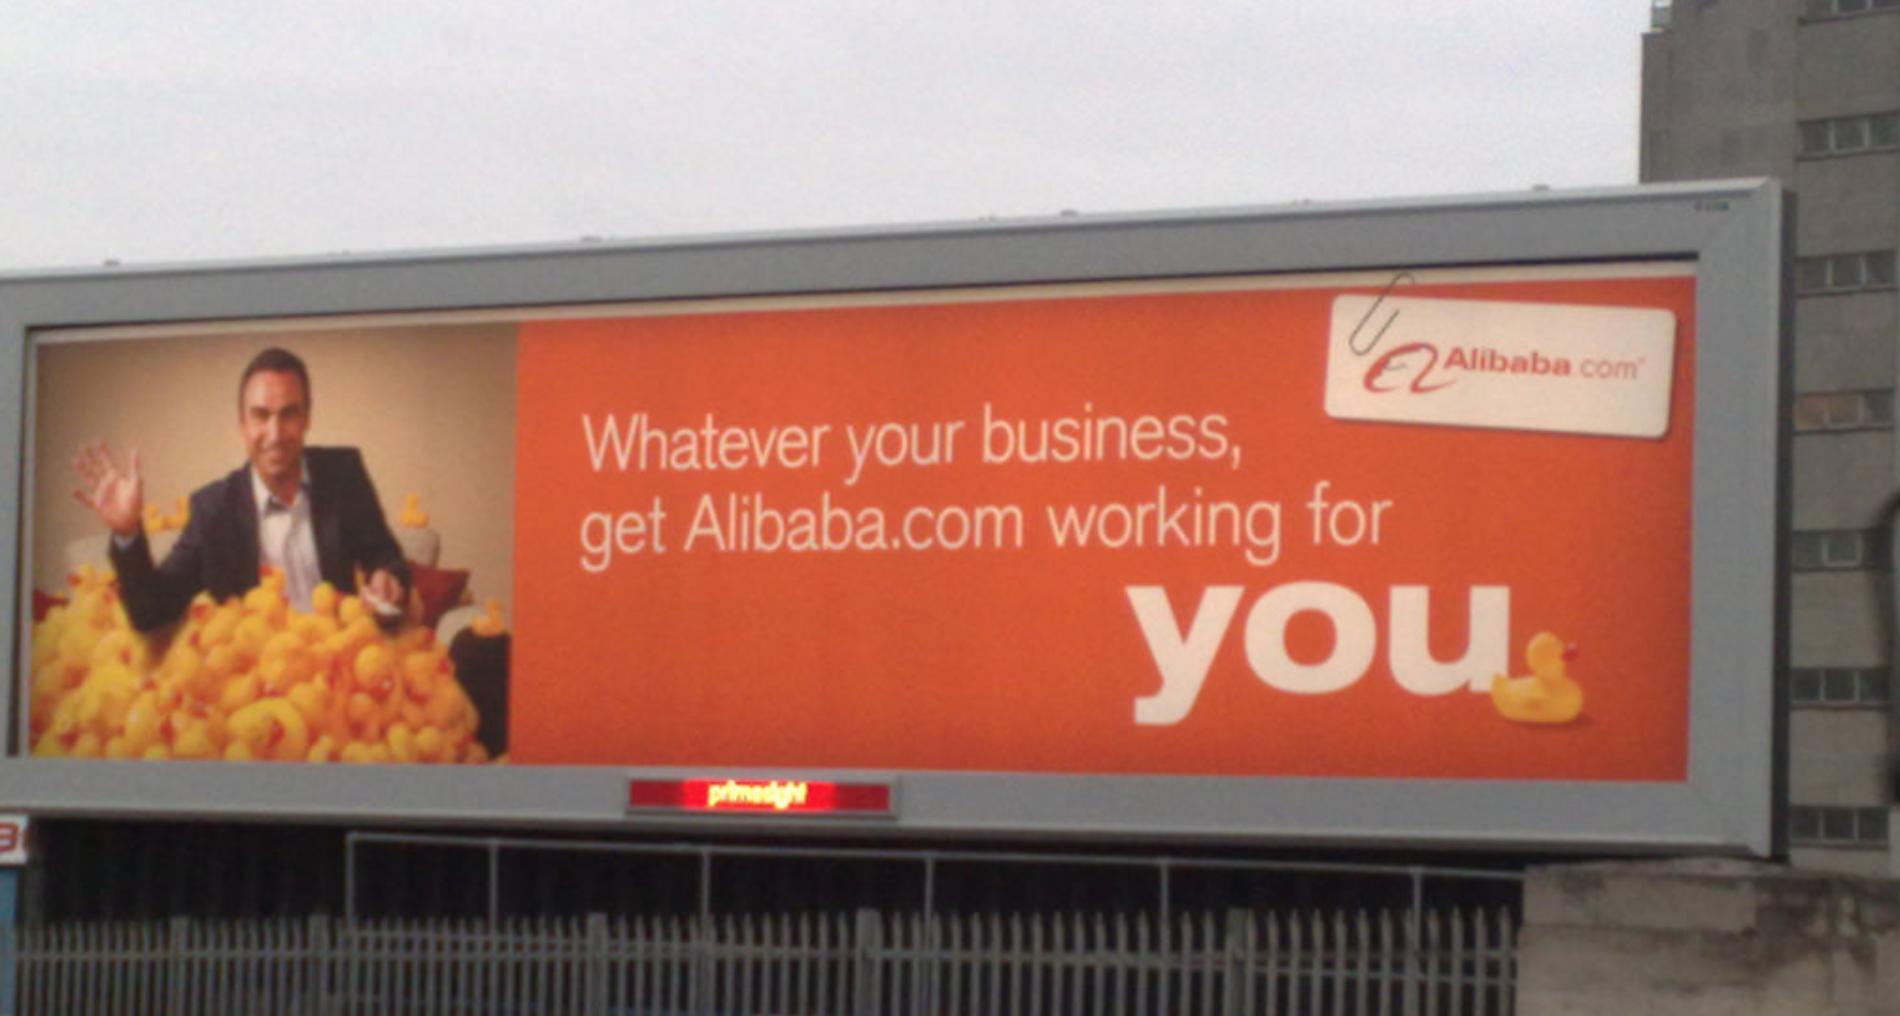 Alibaba's New Hospitality Robot